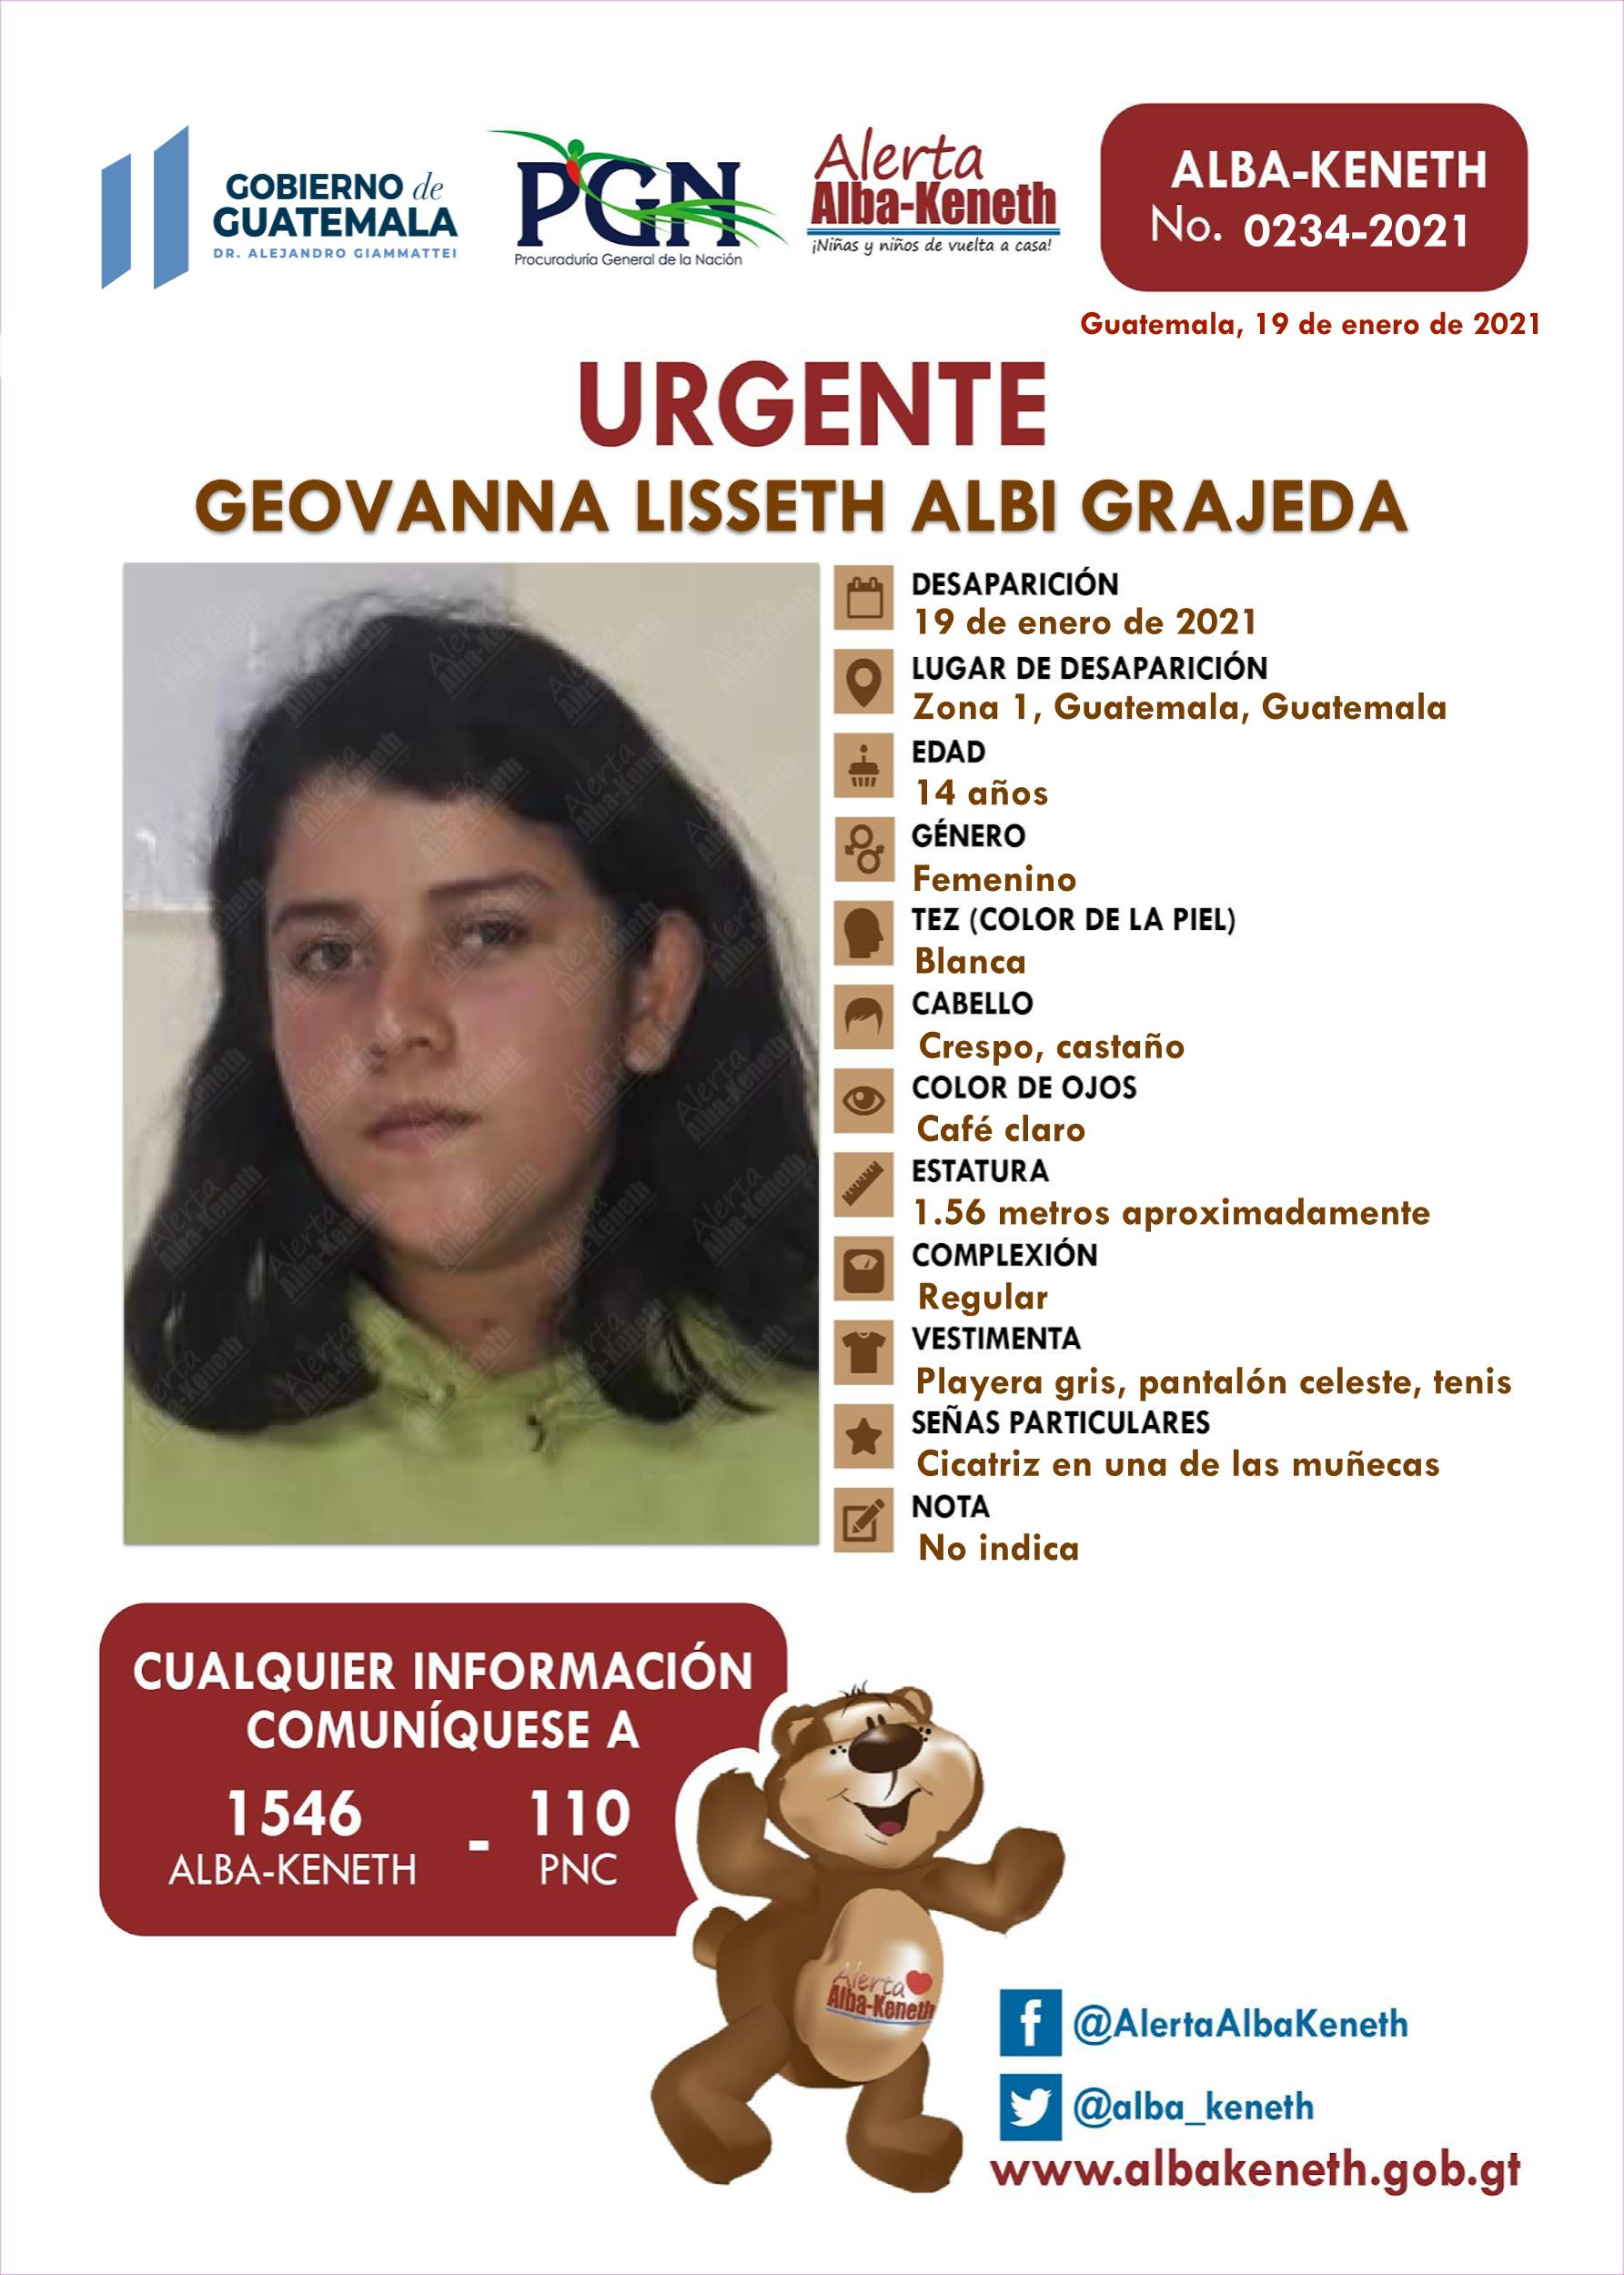 Geovanna Lisseth Albi Grajeda